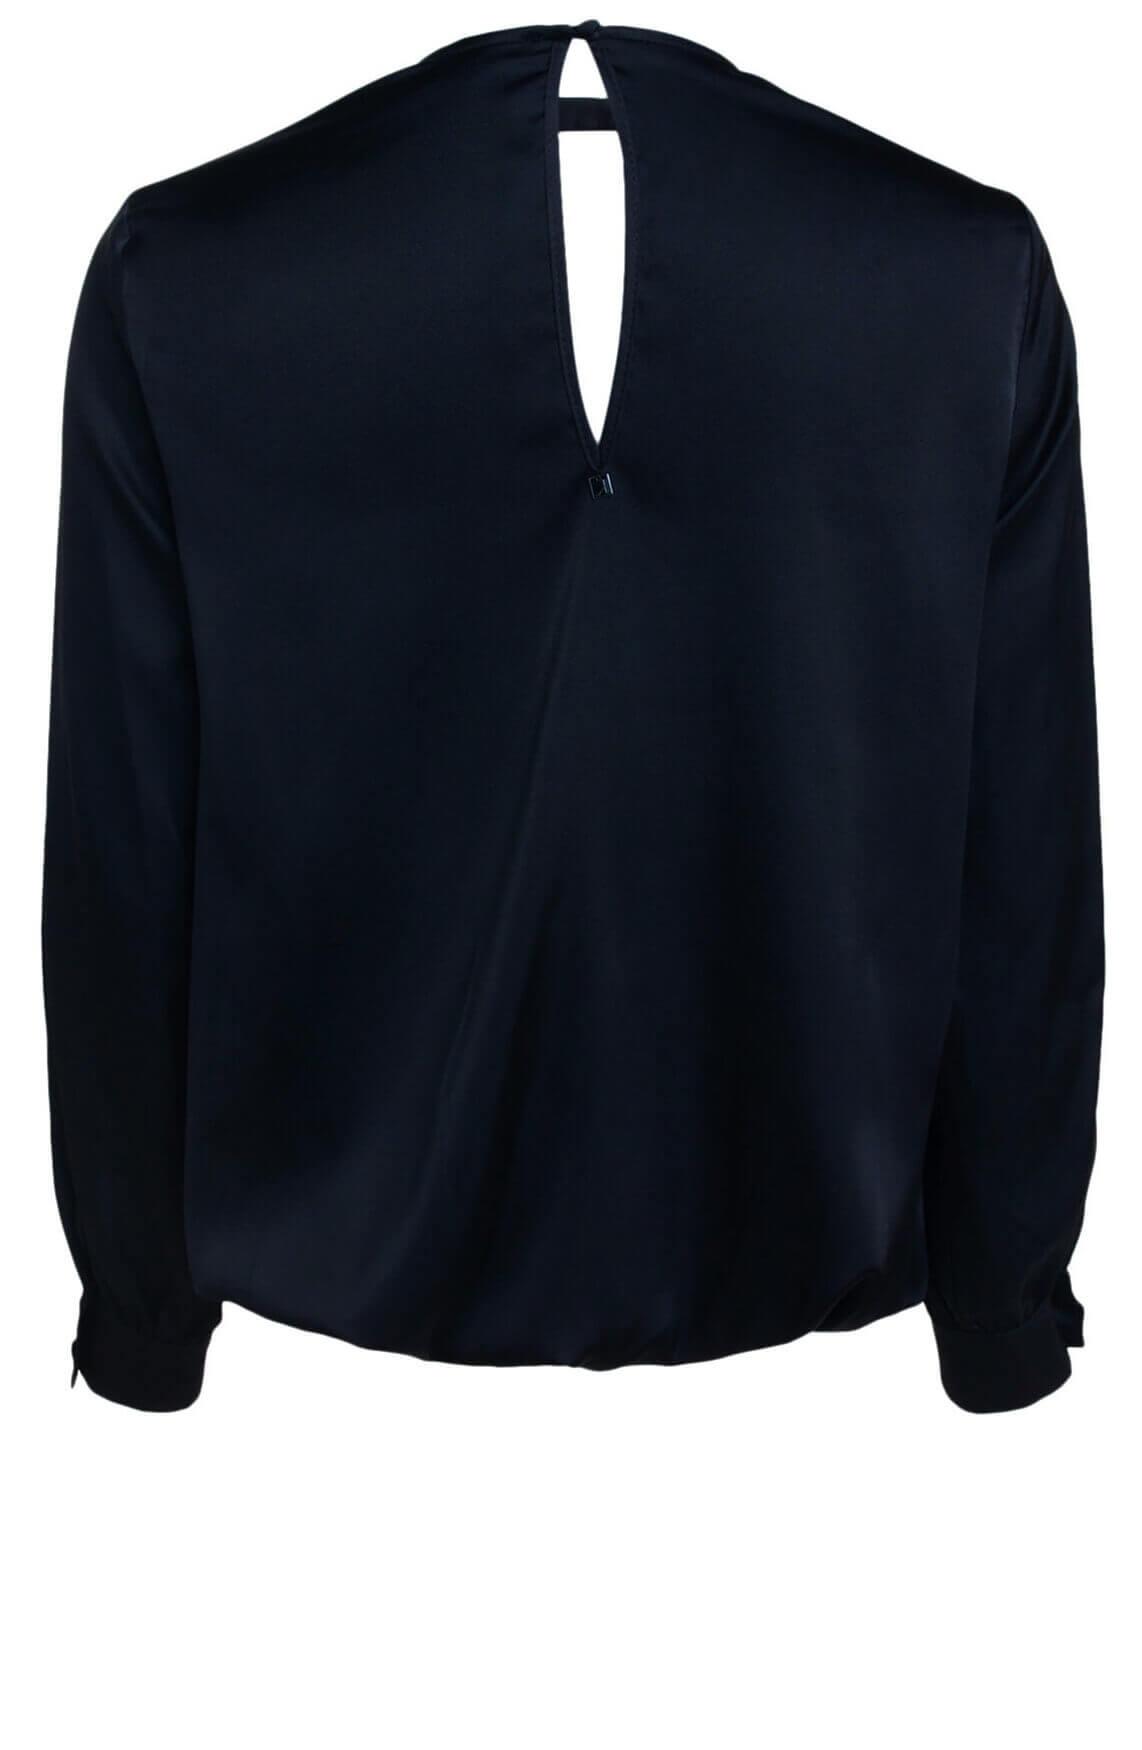 Kocca Dames Emerang blouse zwart